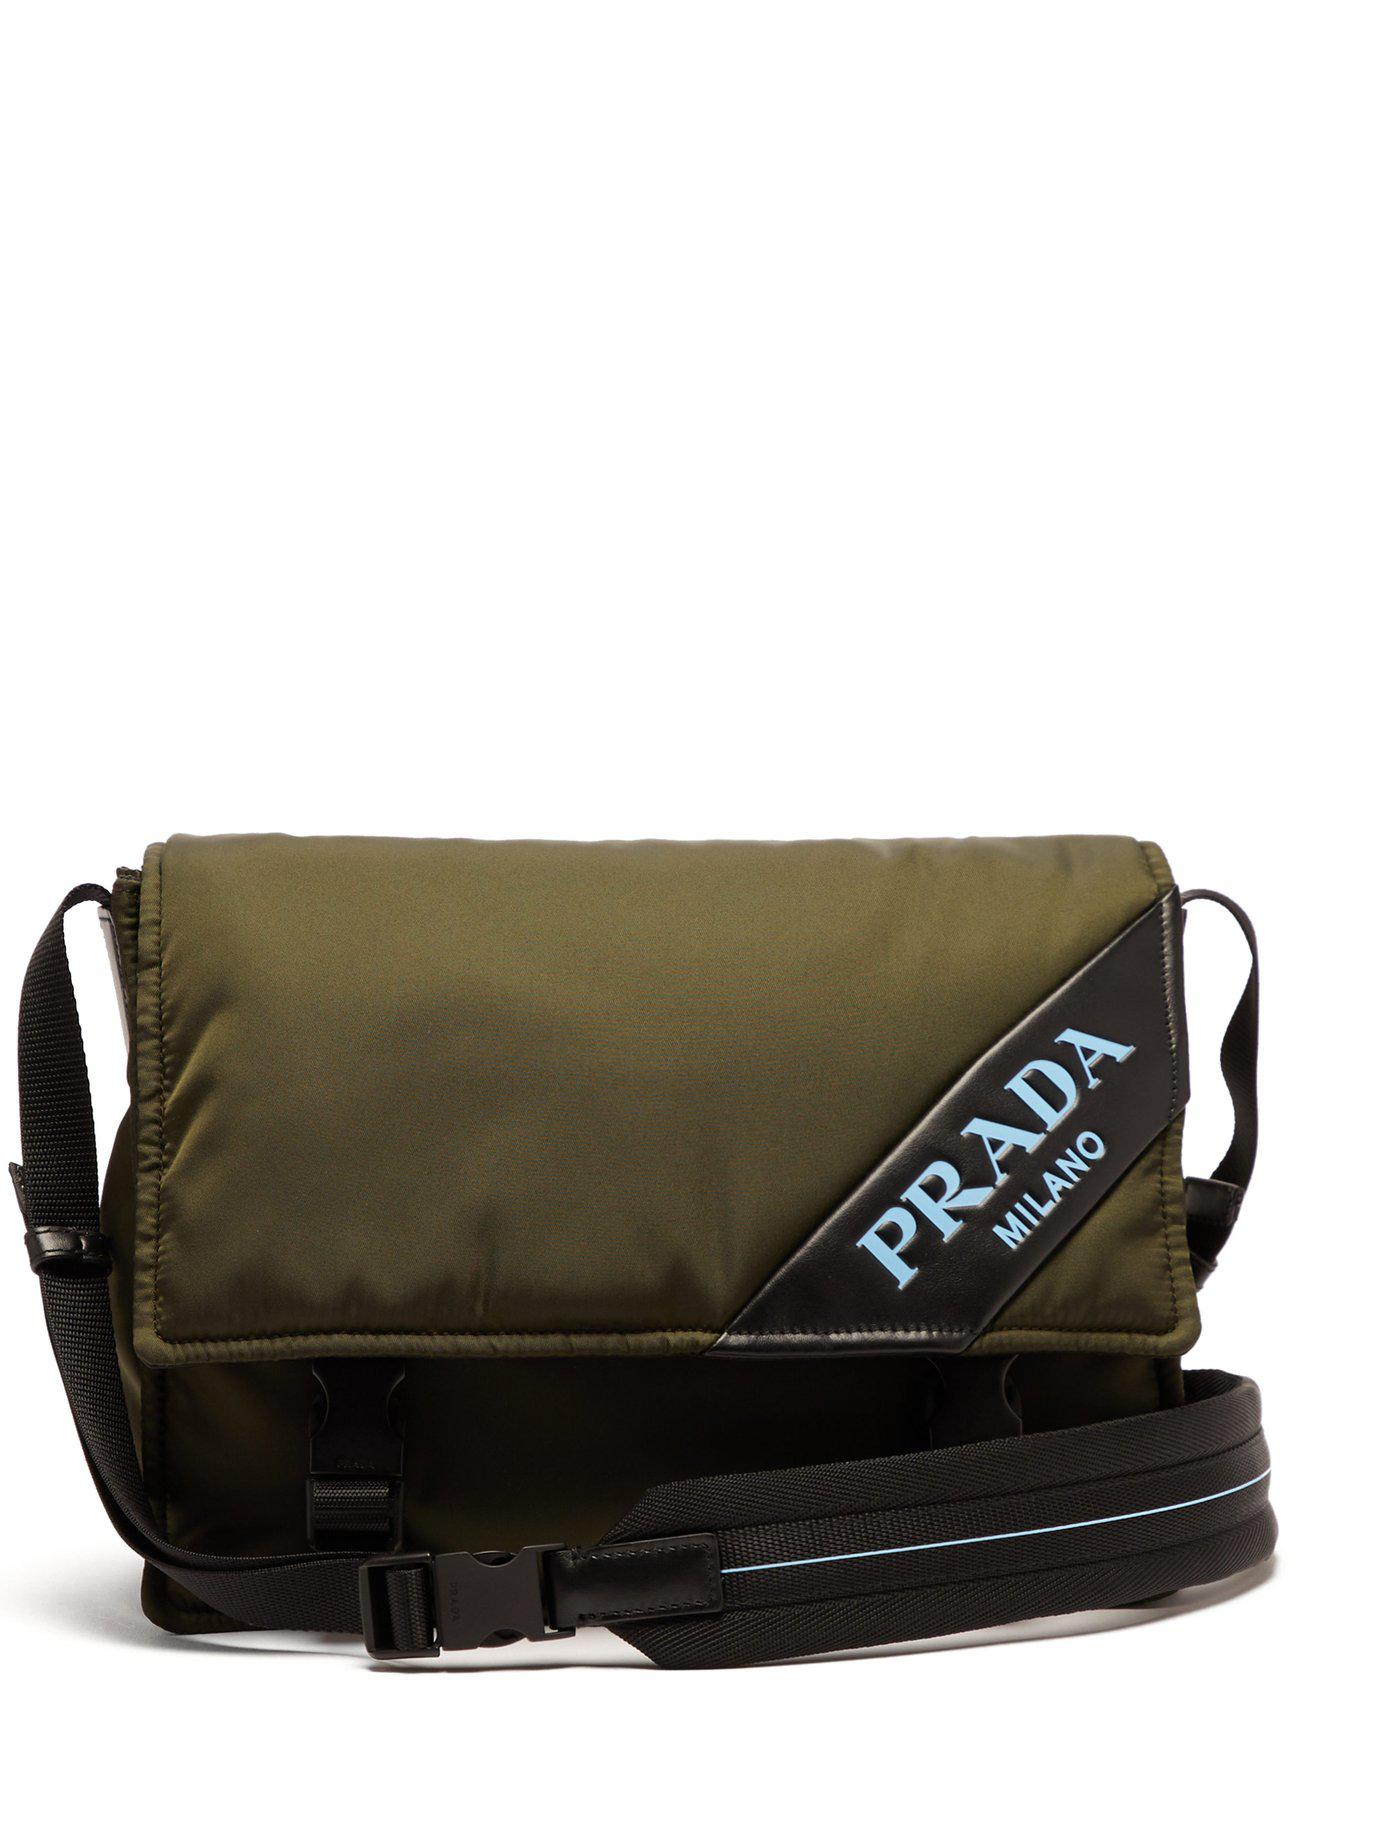 6075a36e11fc Prada - Multicolor Logo Nylon Messenger Bag - Lyst. View fullscreen